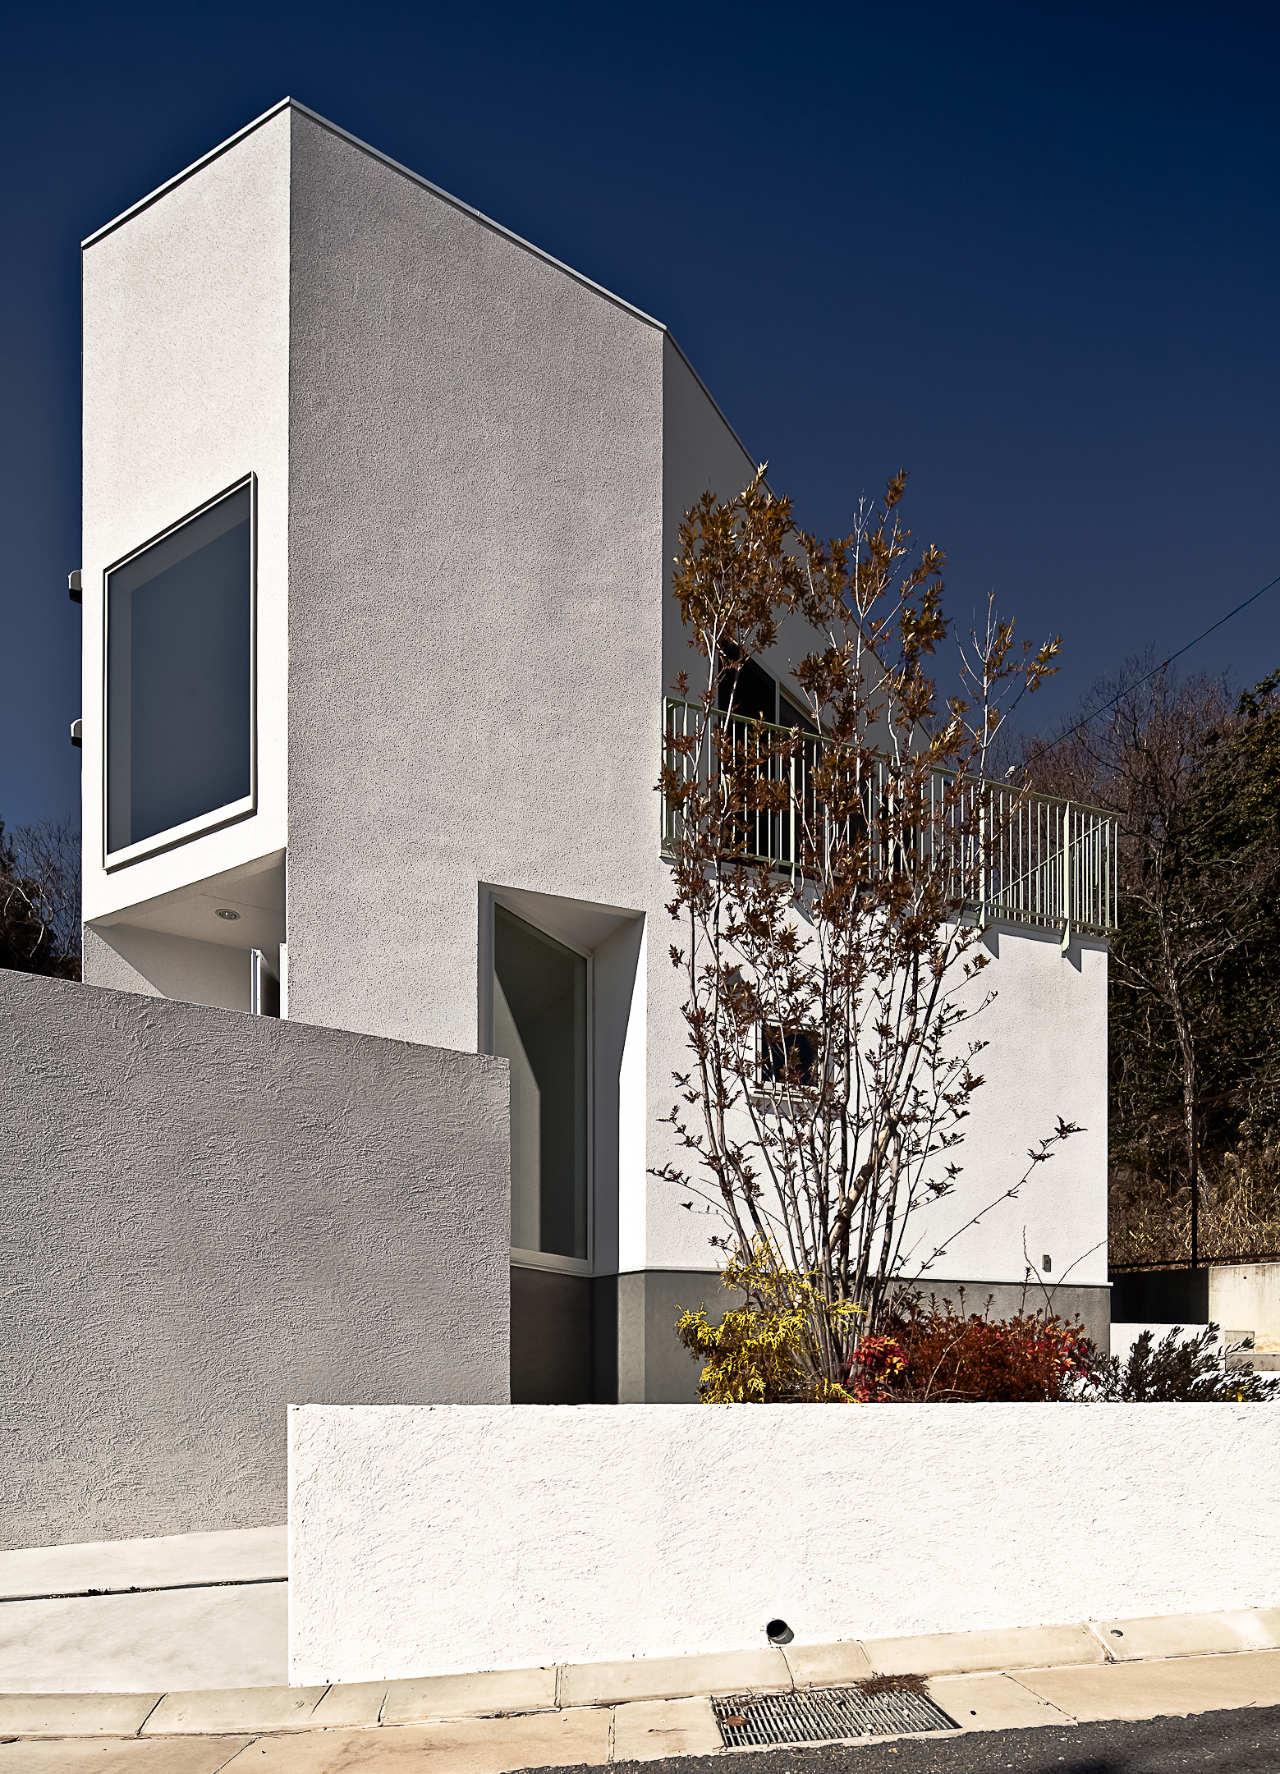 Casa Nomura 24 / Antonino Cardillo architect, © Antonino Cardillo